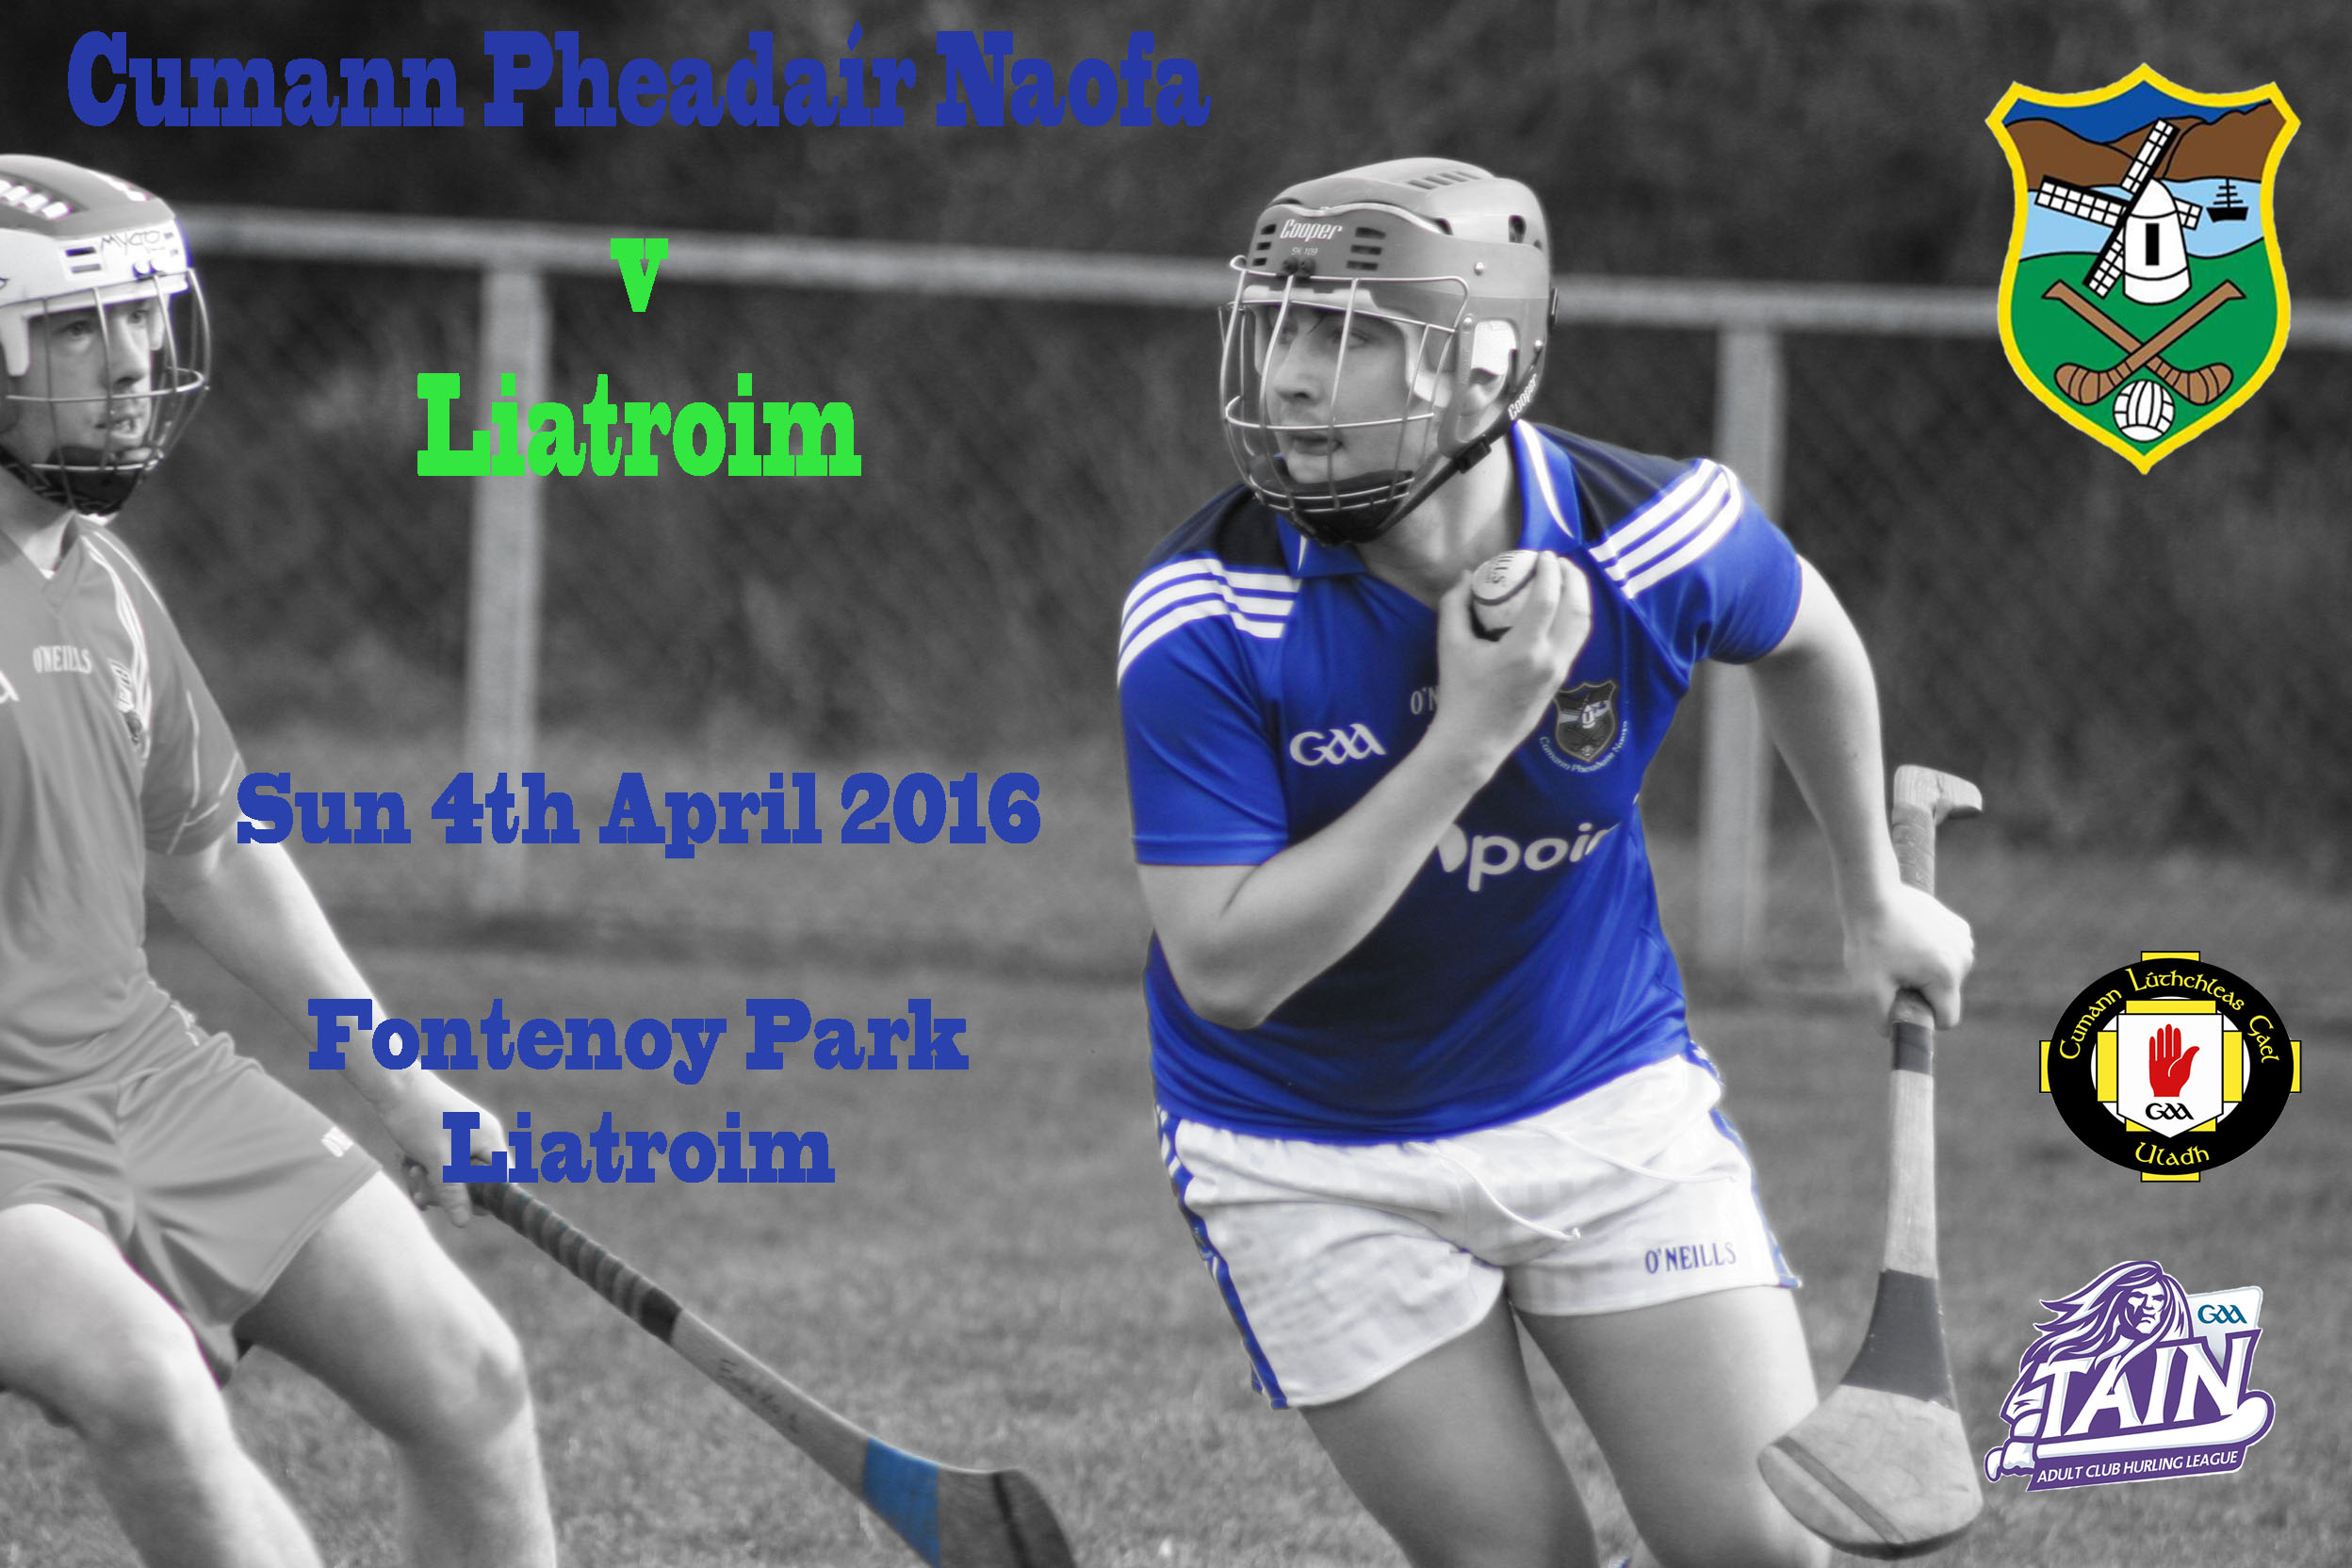 Hurlers to take on Liatroim on Sunday